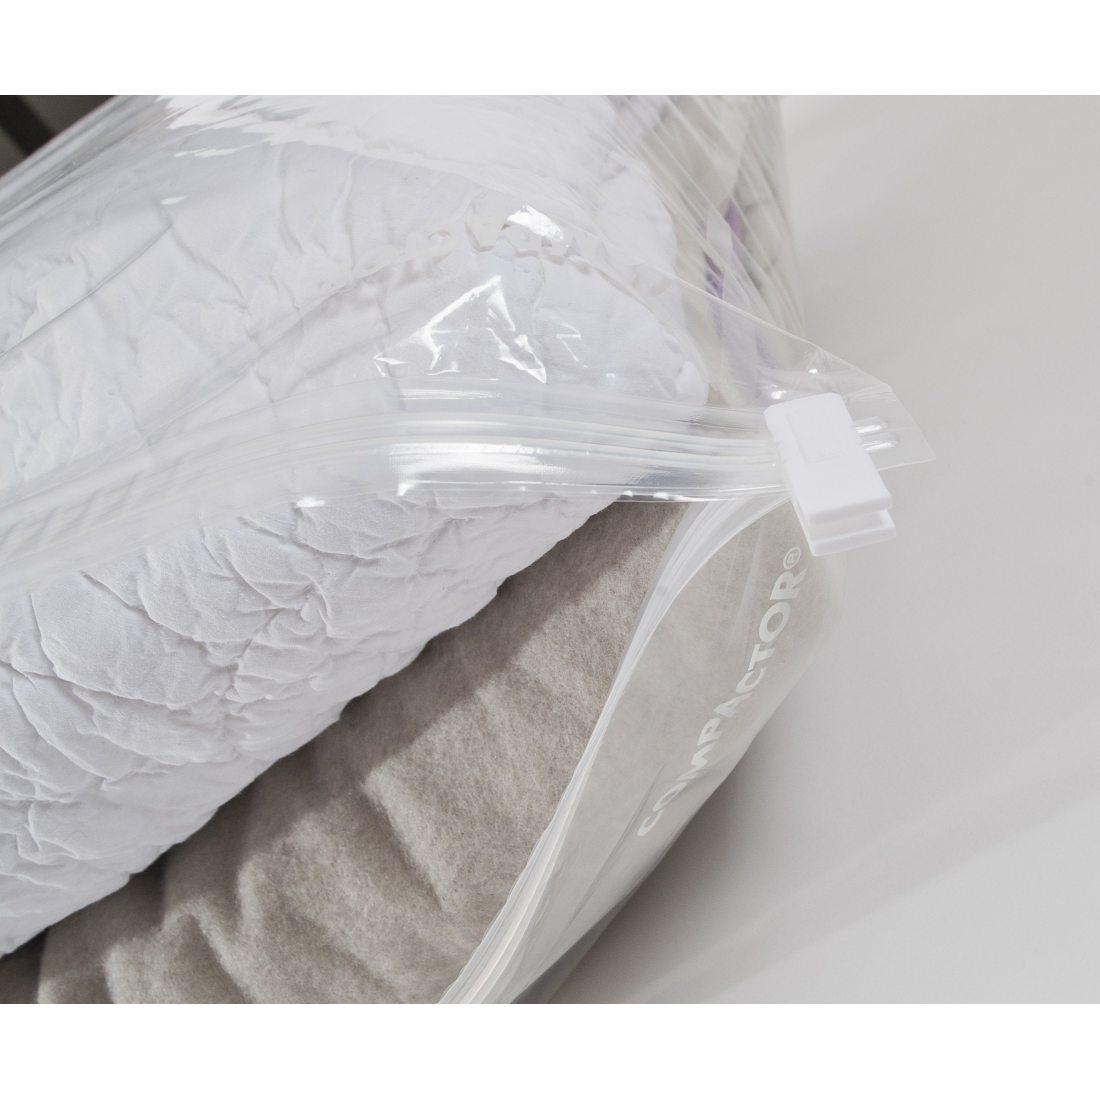 compactor ran4745 housse aspi space nylon poly thyl ne translucide 80 x 1 x 100 cm moyen mod le. Black Bedroom Furniture Sets. Home Design Ideas